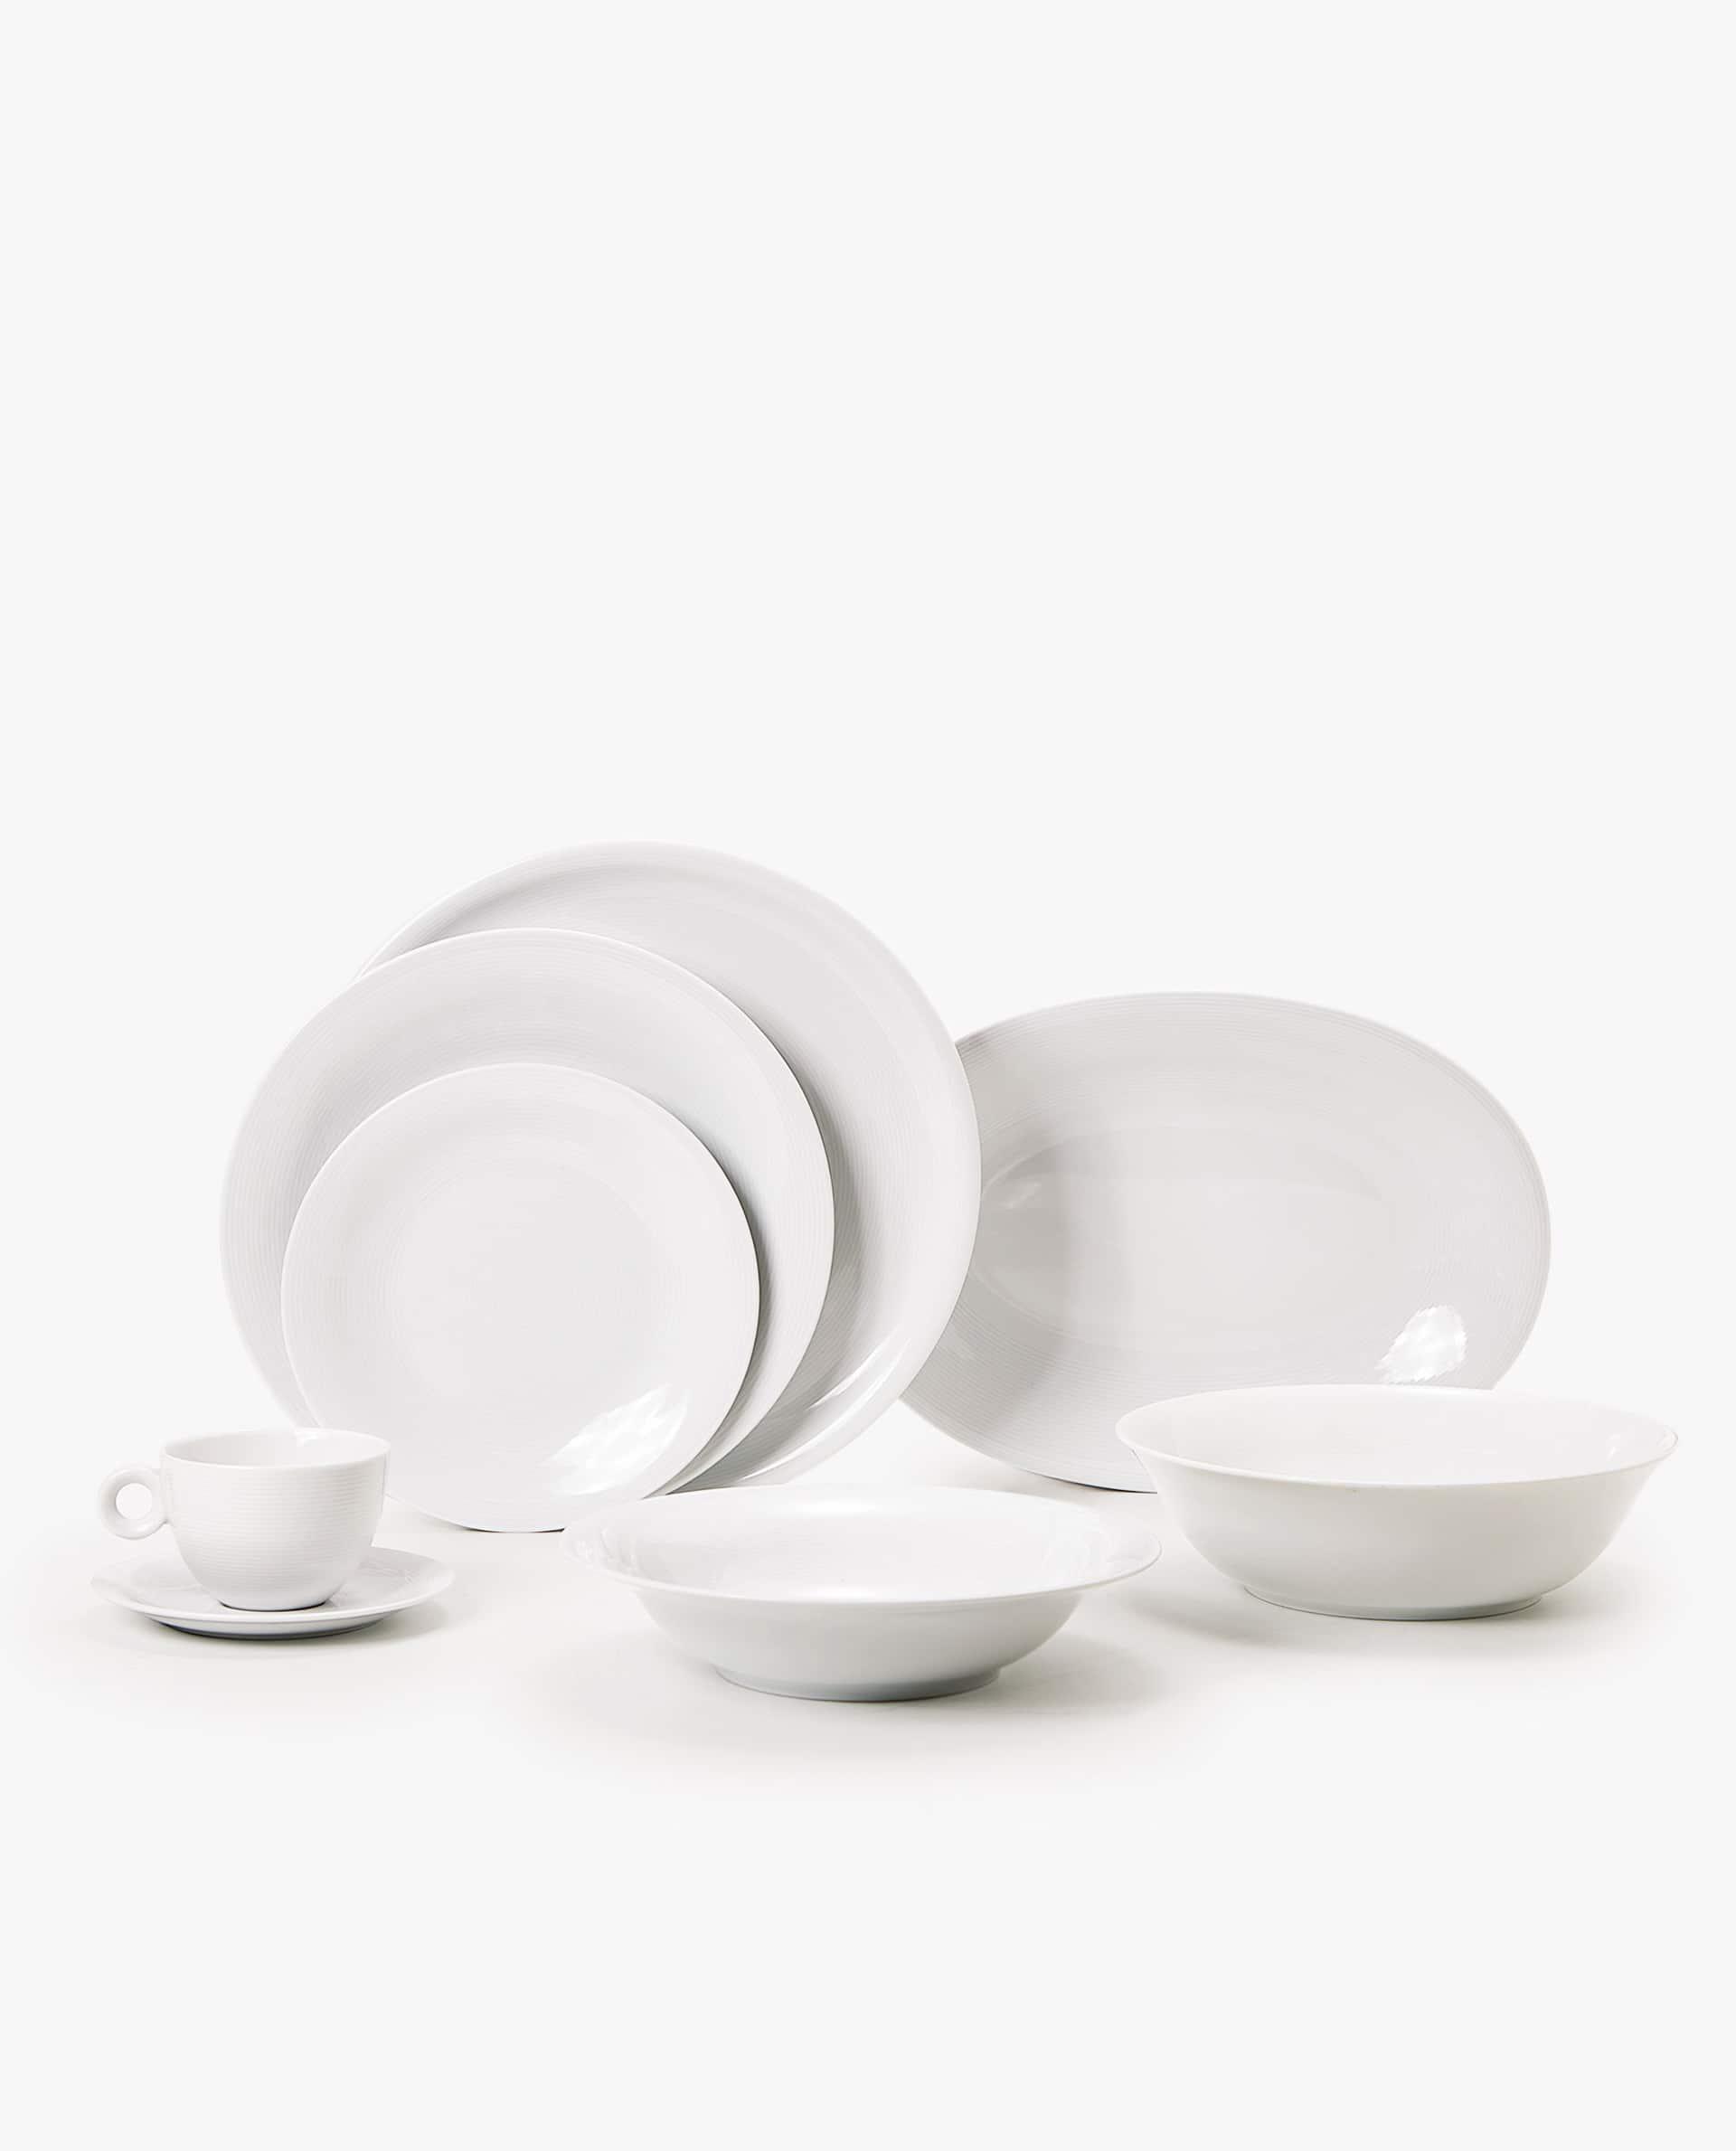 Vajilla De Porcelana X8d1 Vajilla Porcelana Blanca Esenciales Edor Zara Home Uruguay